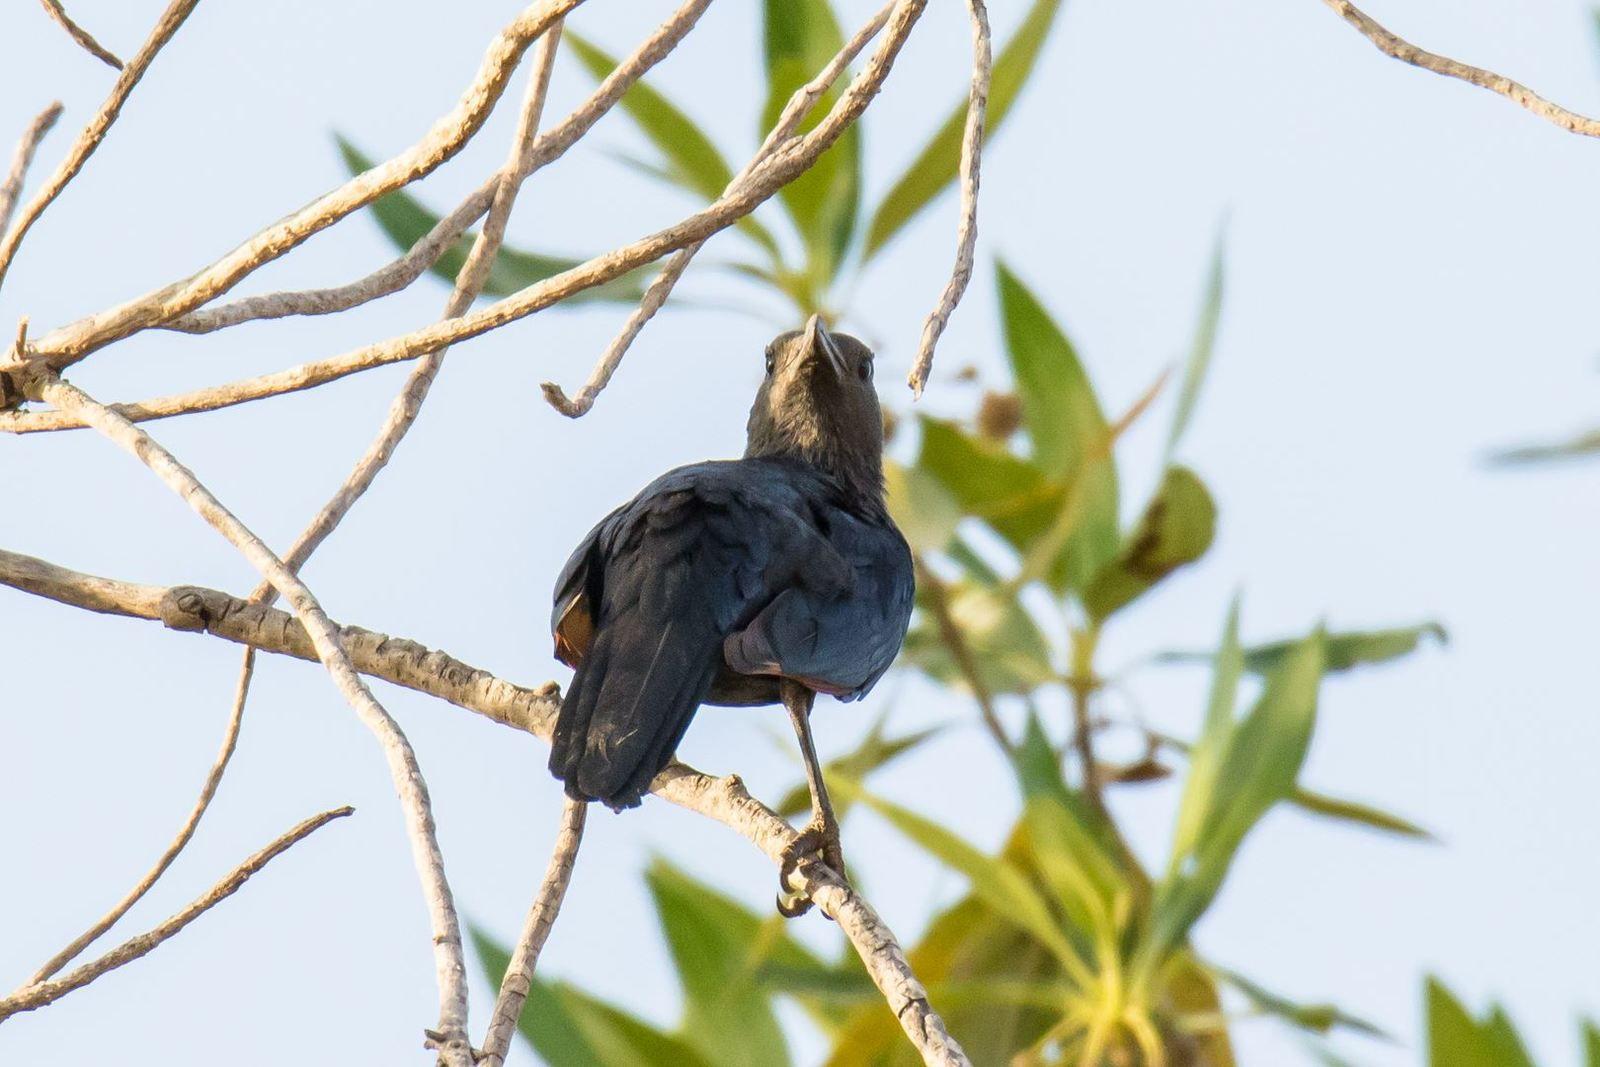 Traquet femelle - Banfora -  Burkina - Sa tête pivote à 180°